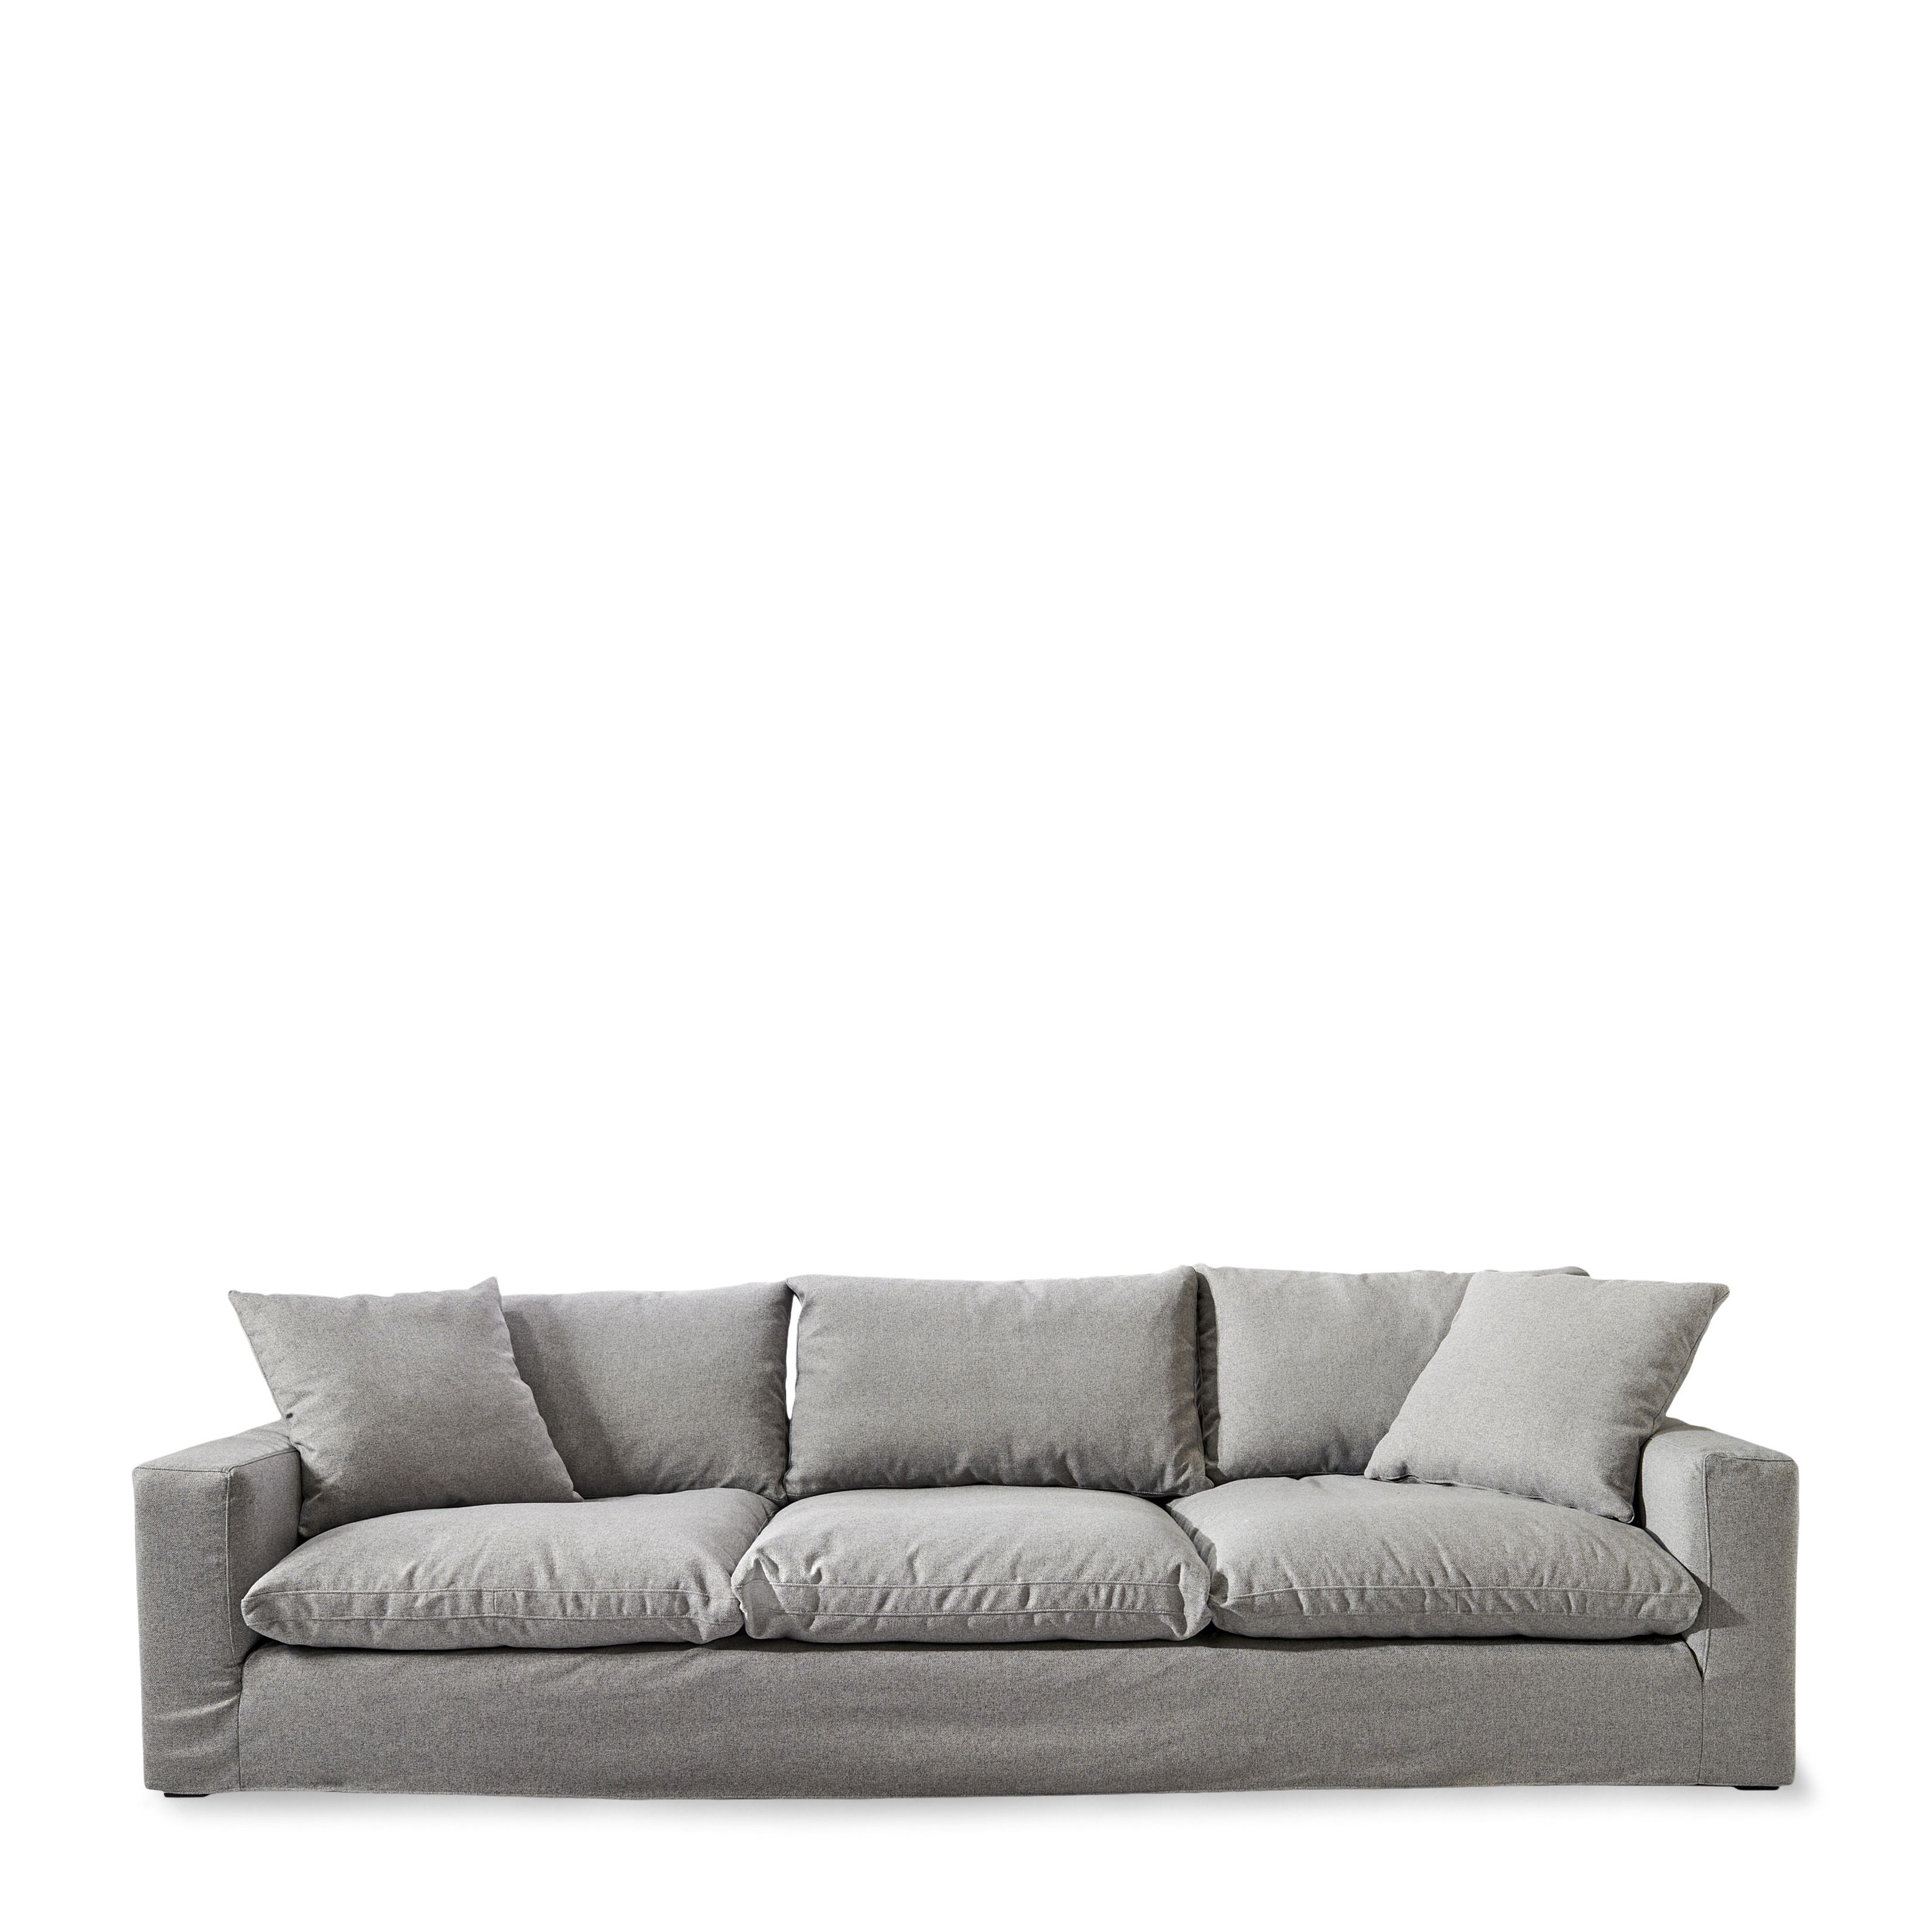 Residenza Sofa XL oxford weave steel grey / Rivièra Maison